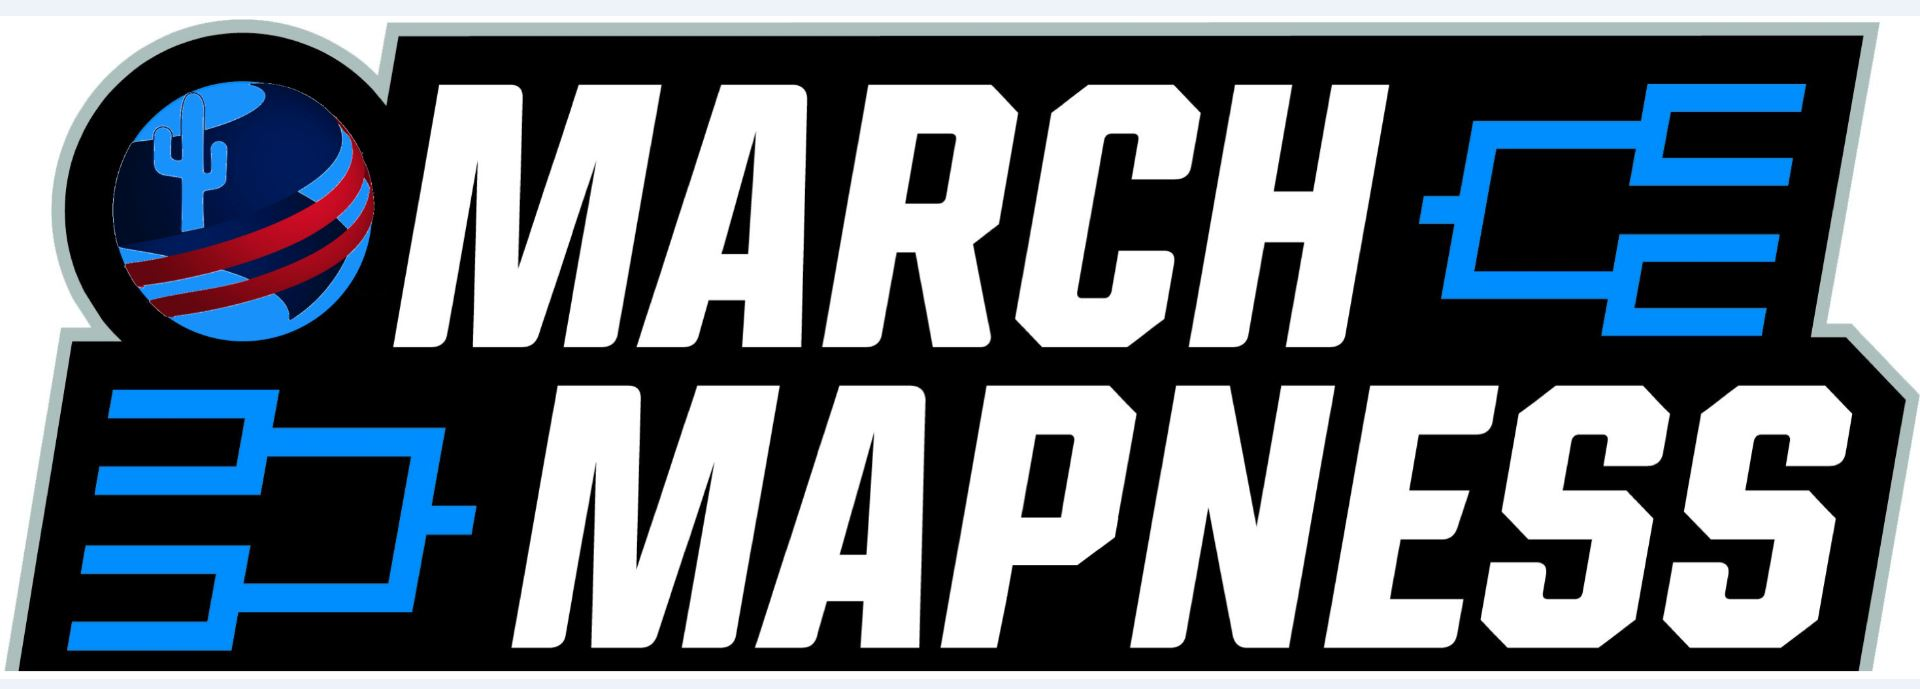 Marchmapness2.tif